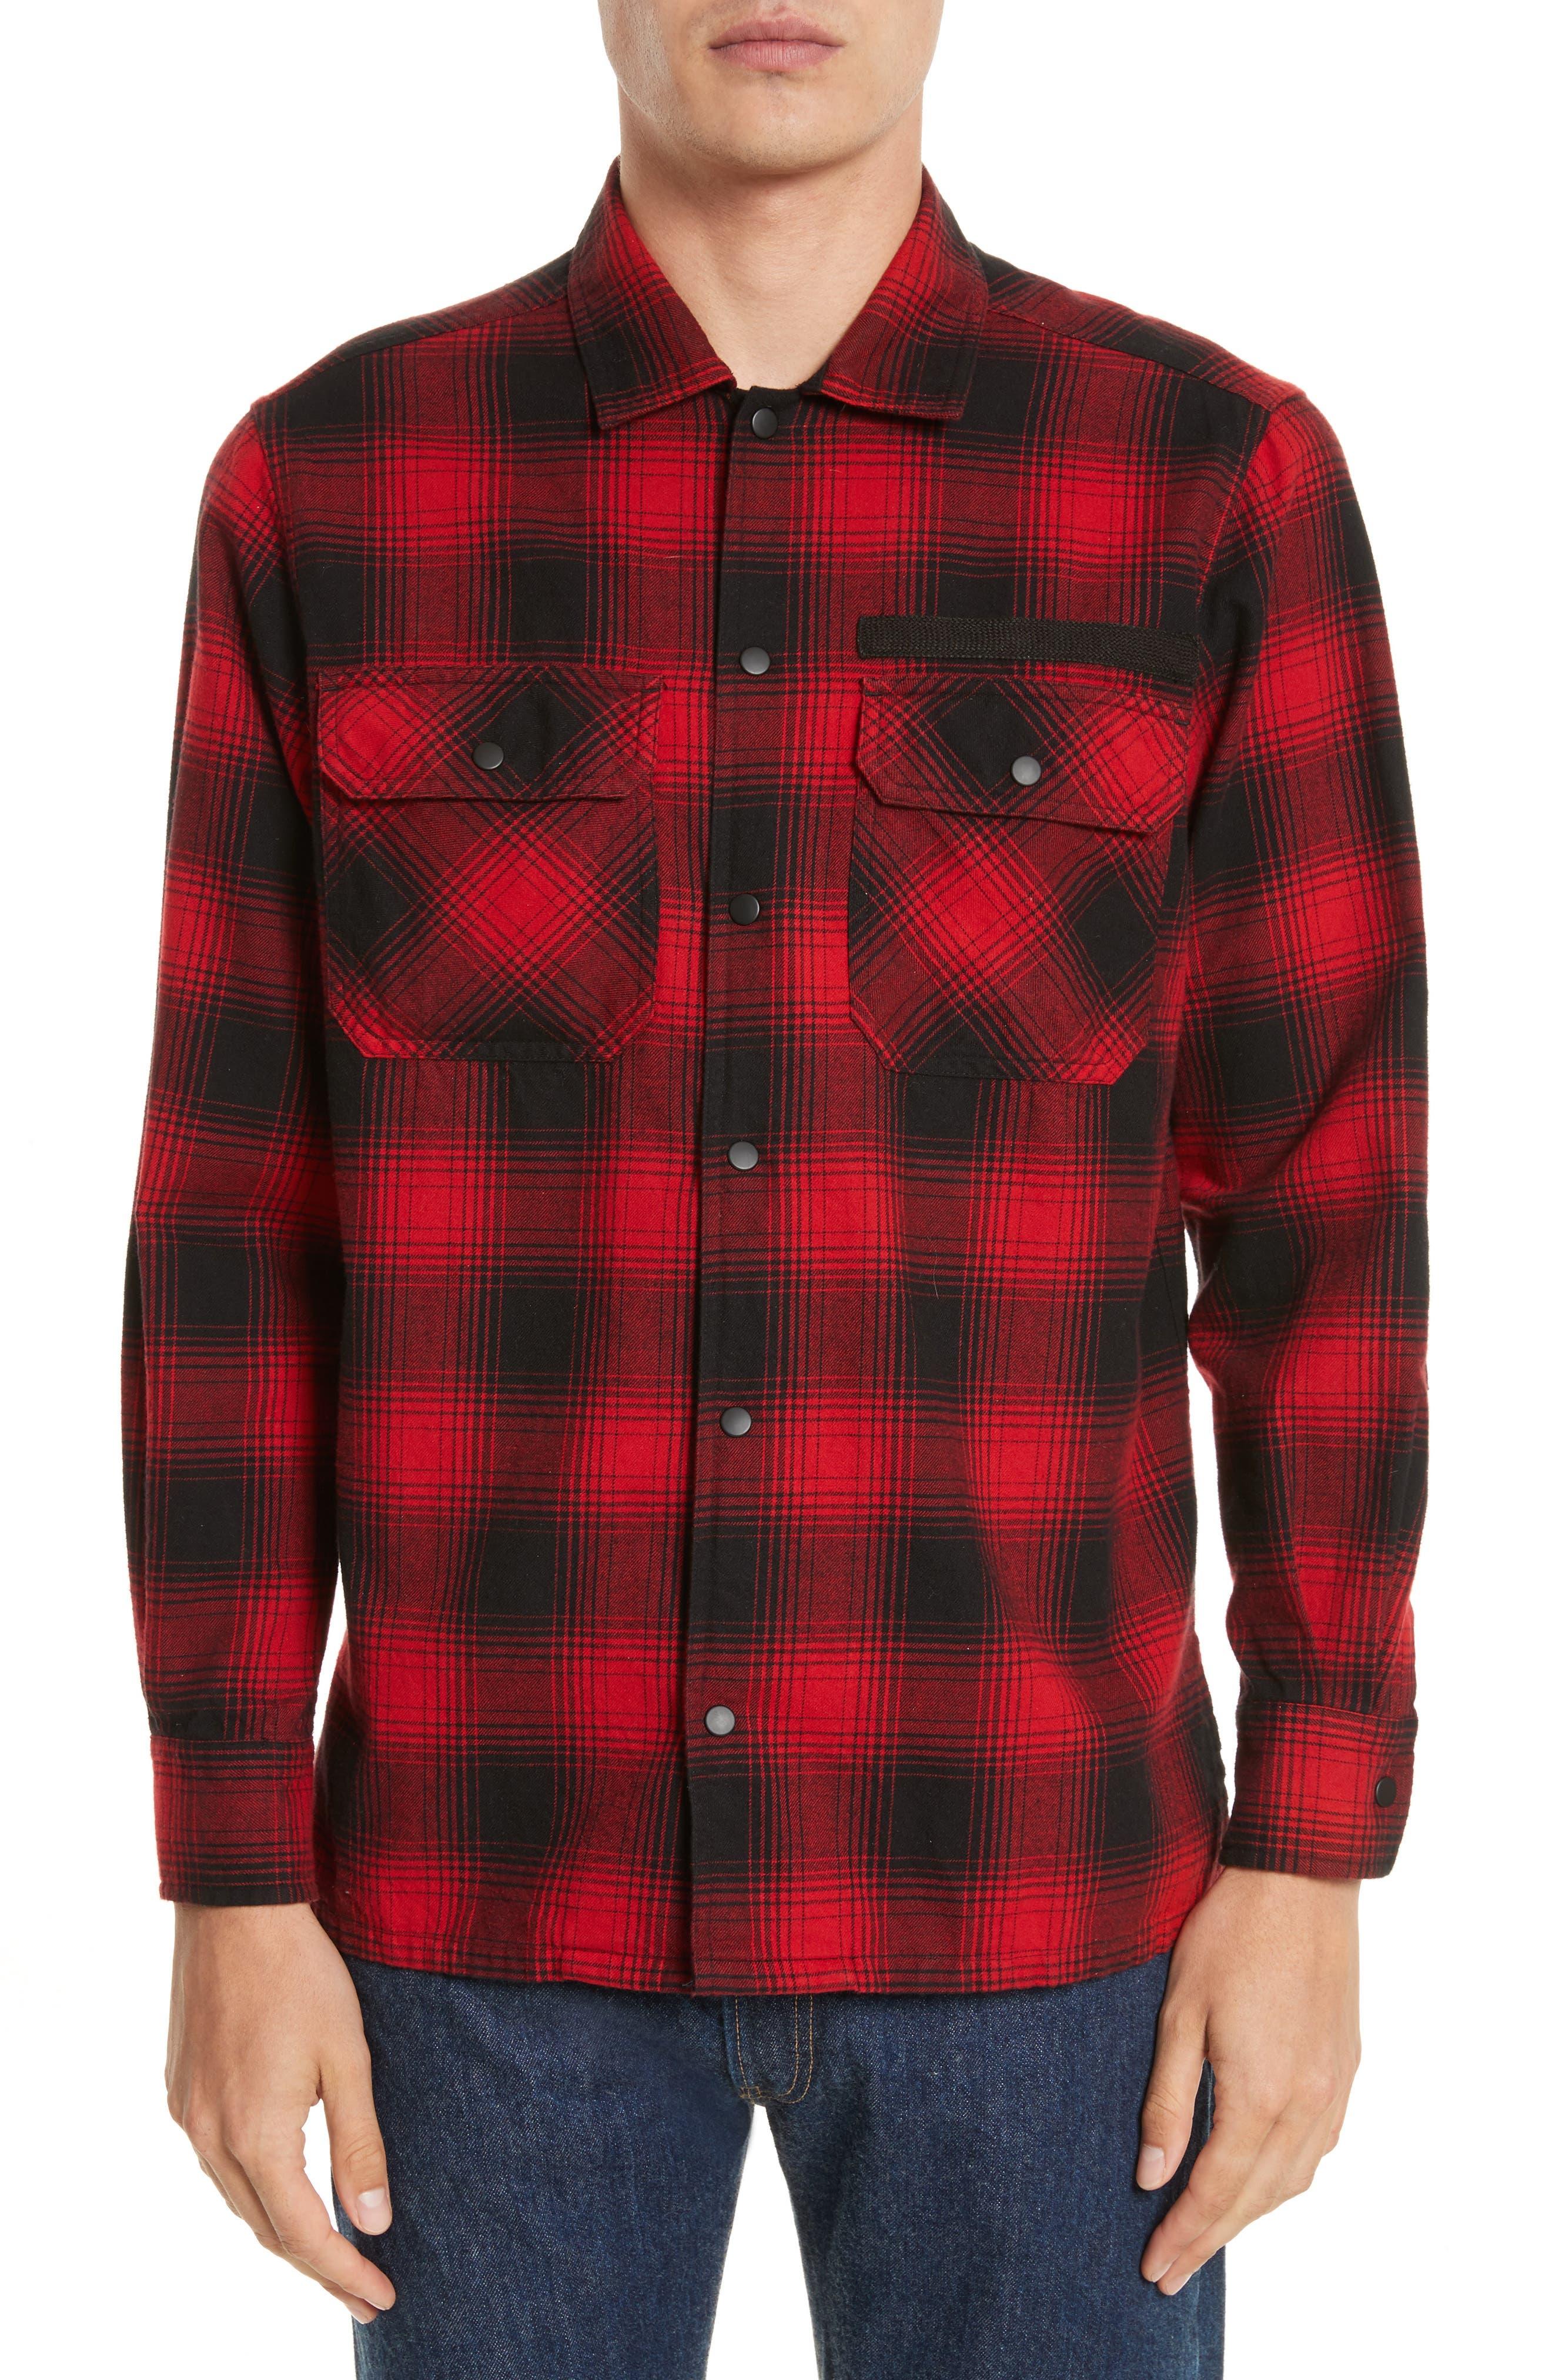 OVADIA & SONS Plaid Flannel Shirt